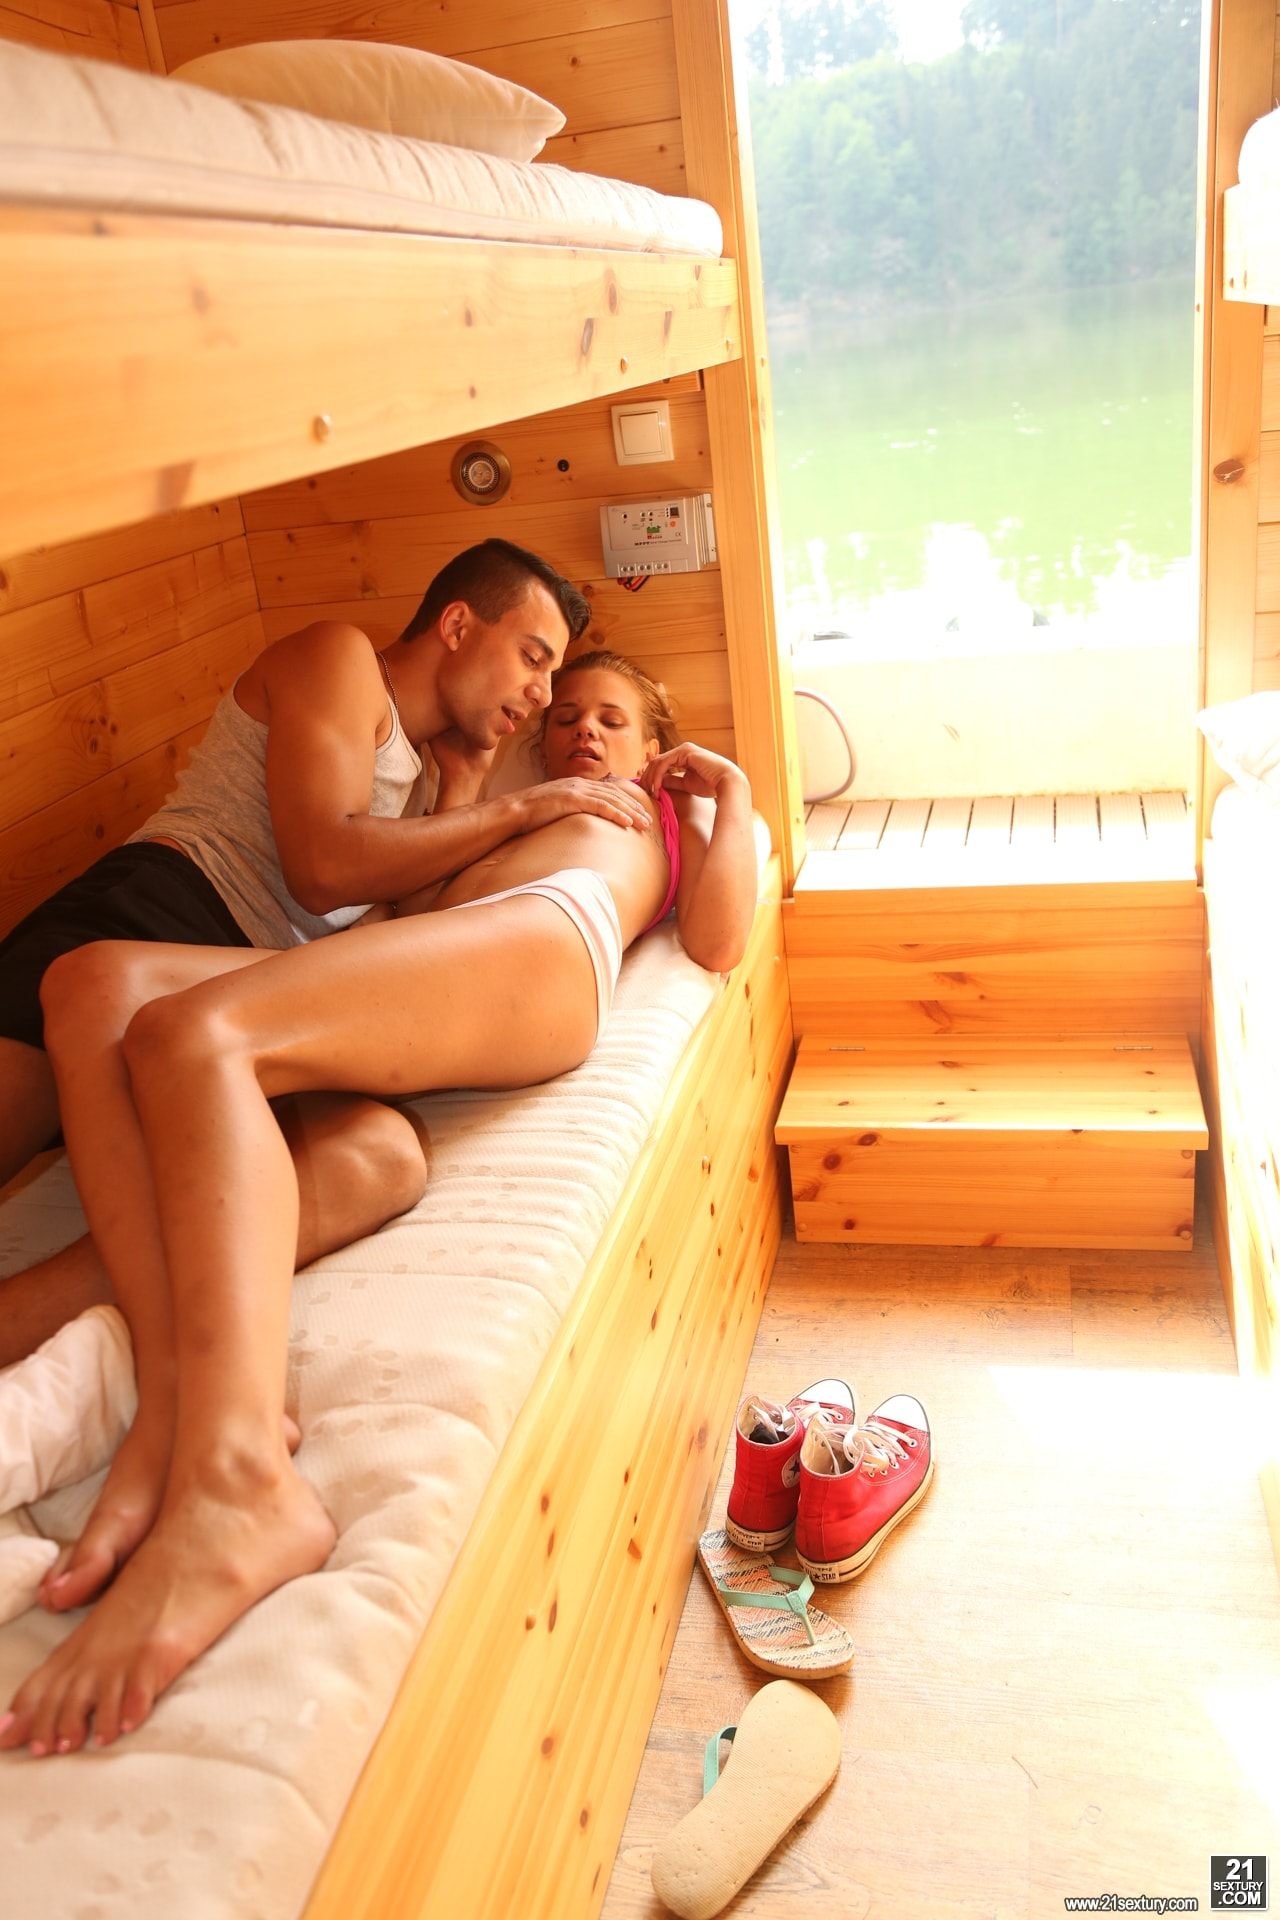 21Sextury 'House Boat Full of Teens' starring Sara Kay (Photo 10)